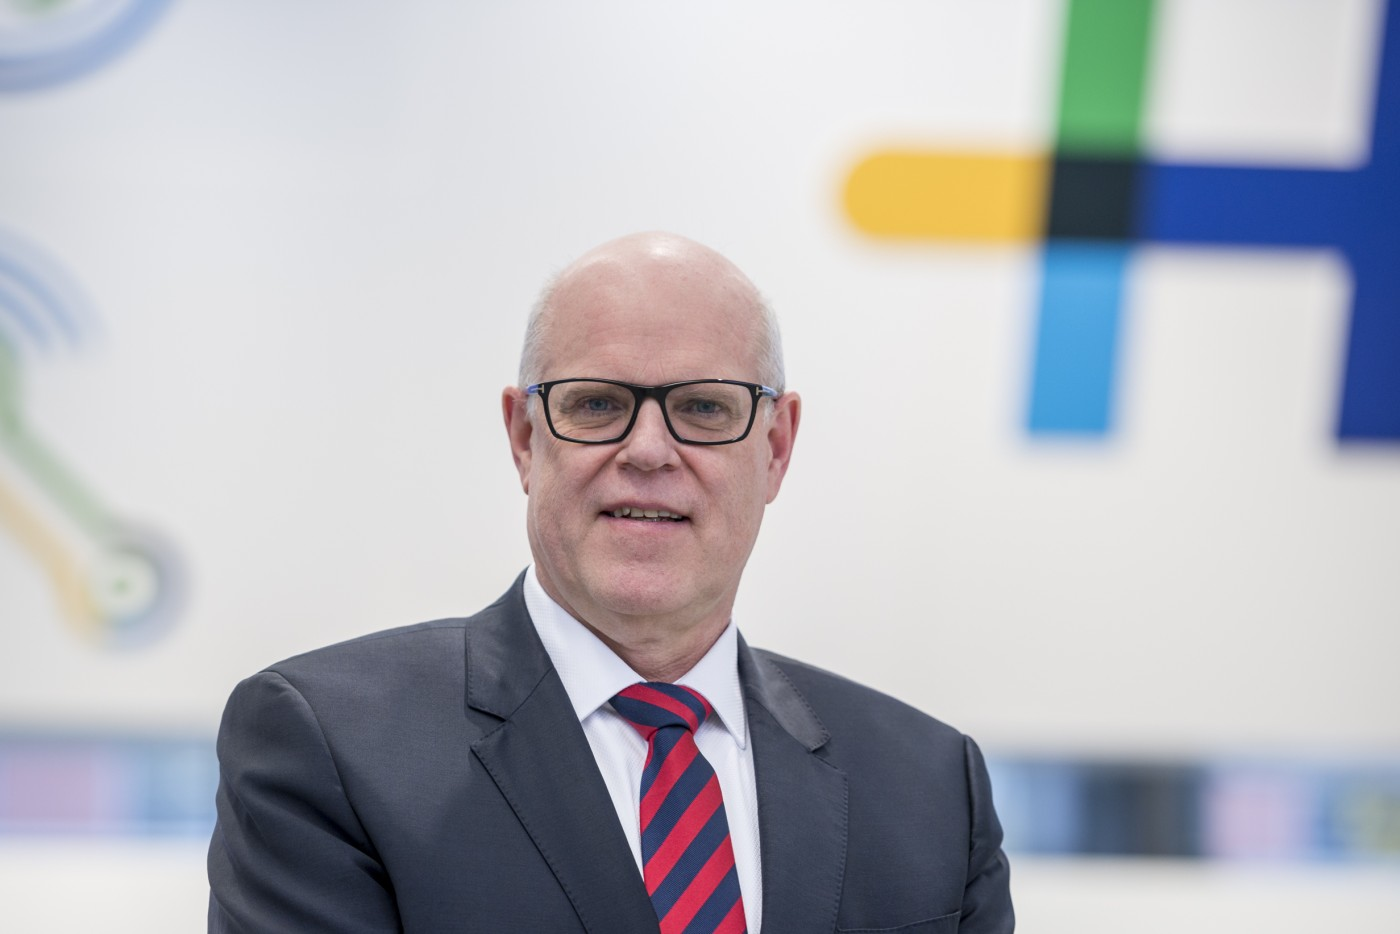 01_Rainer_Hundsdoerfer_CEO_Heidelberg_full